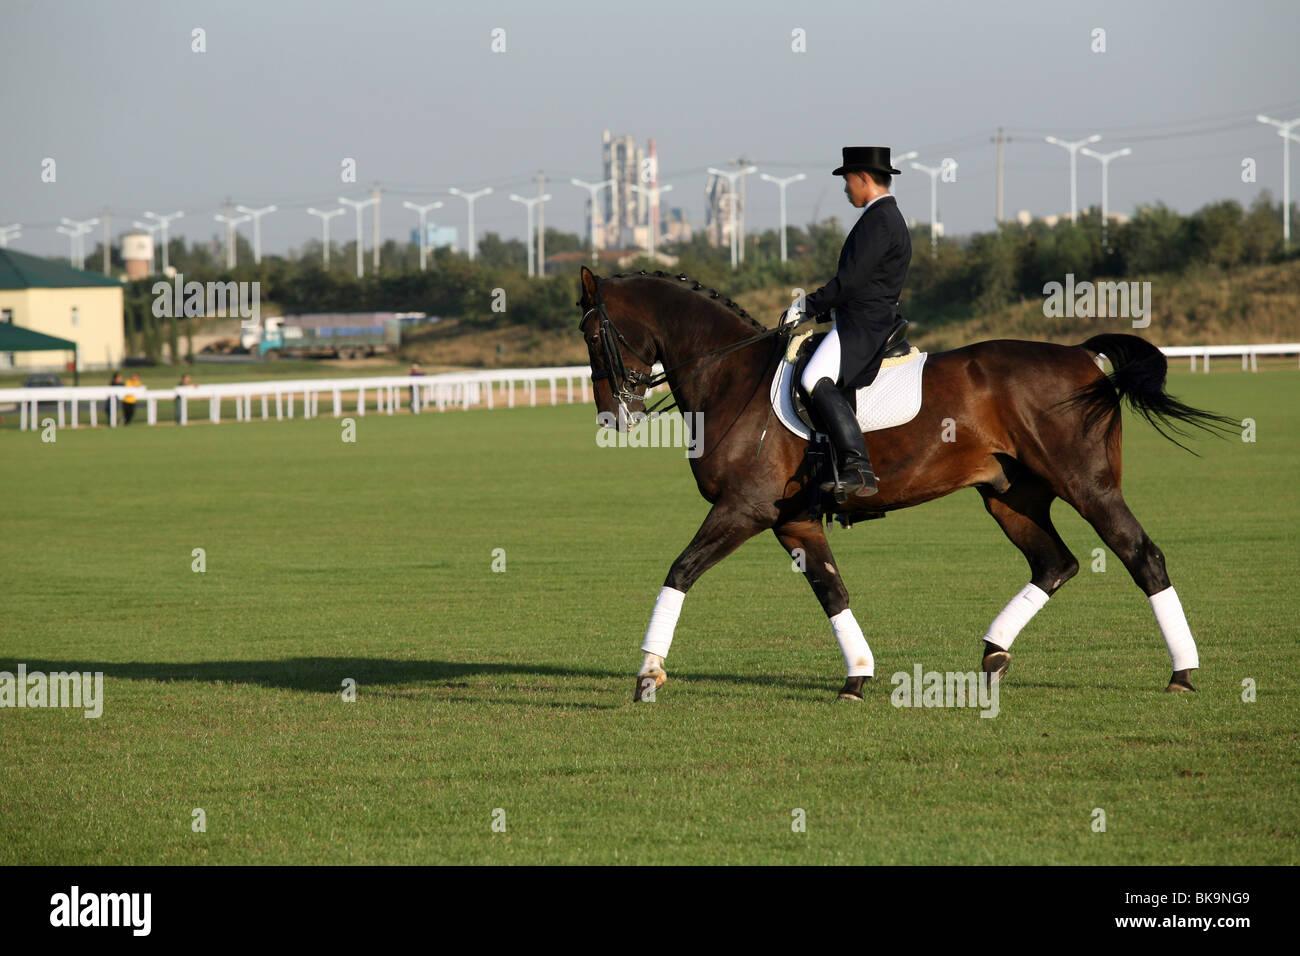 Horse racing,China - Stock Image